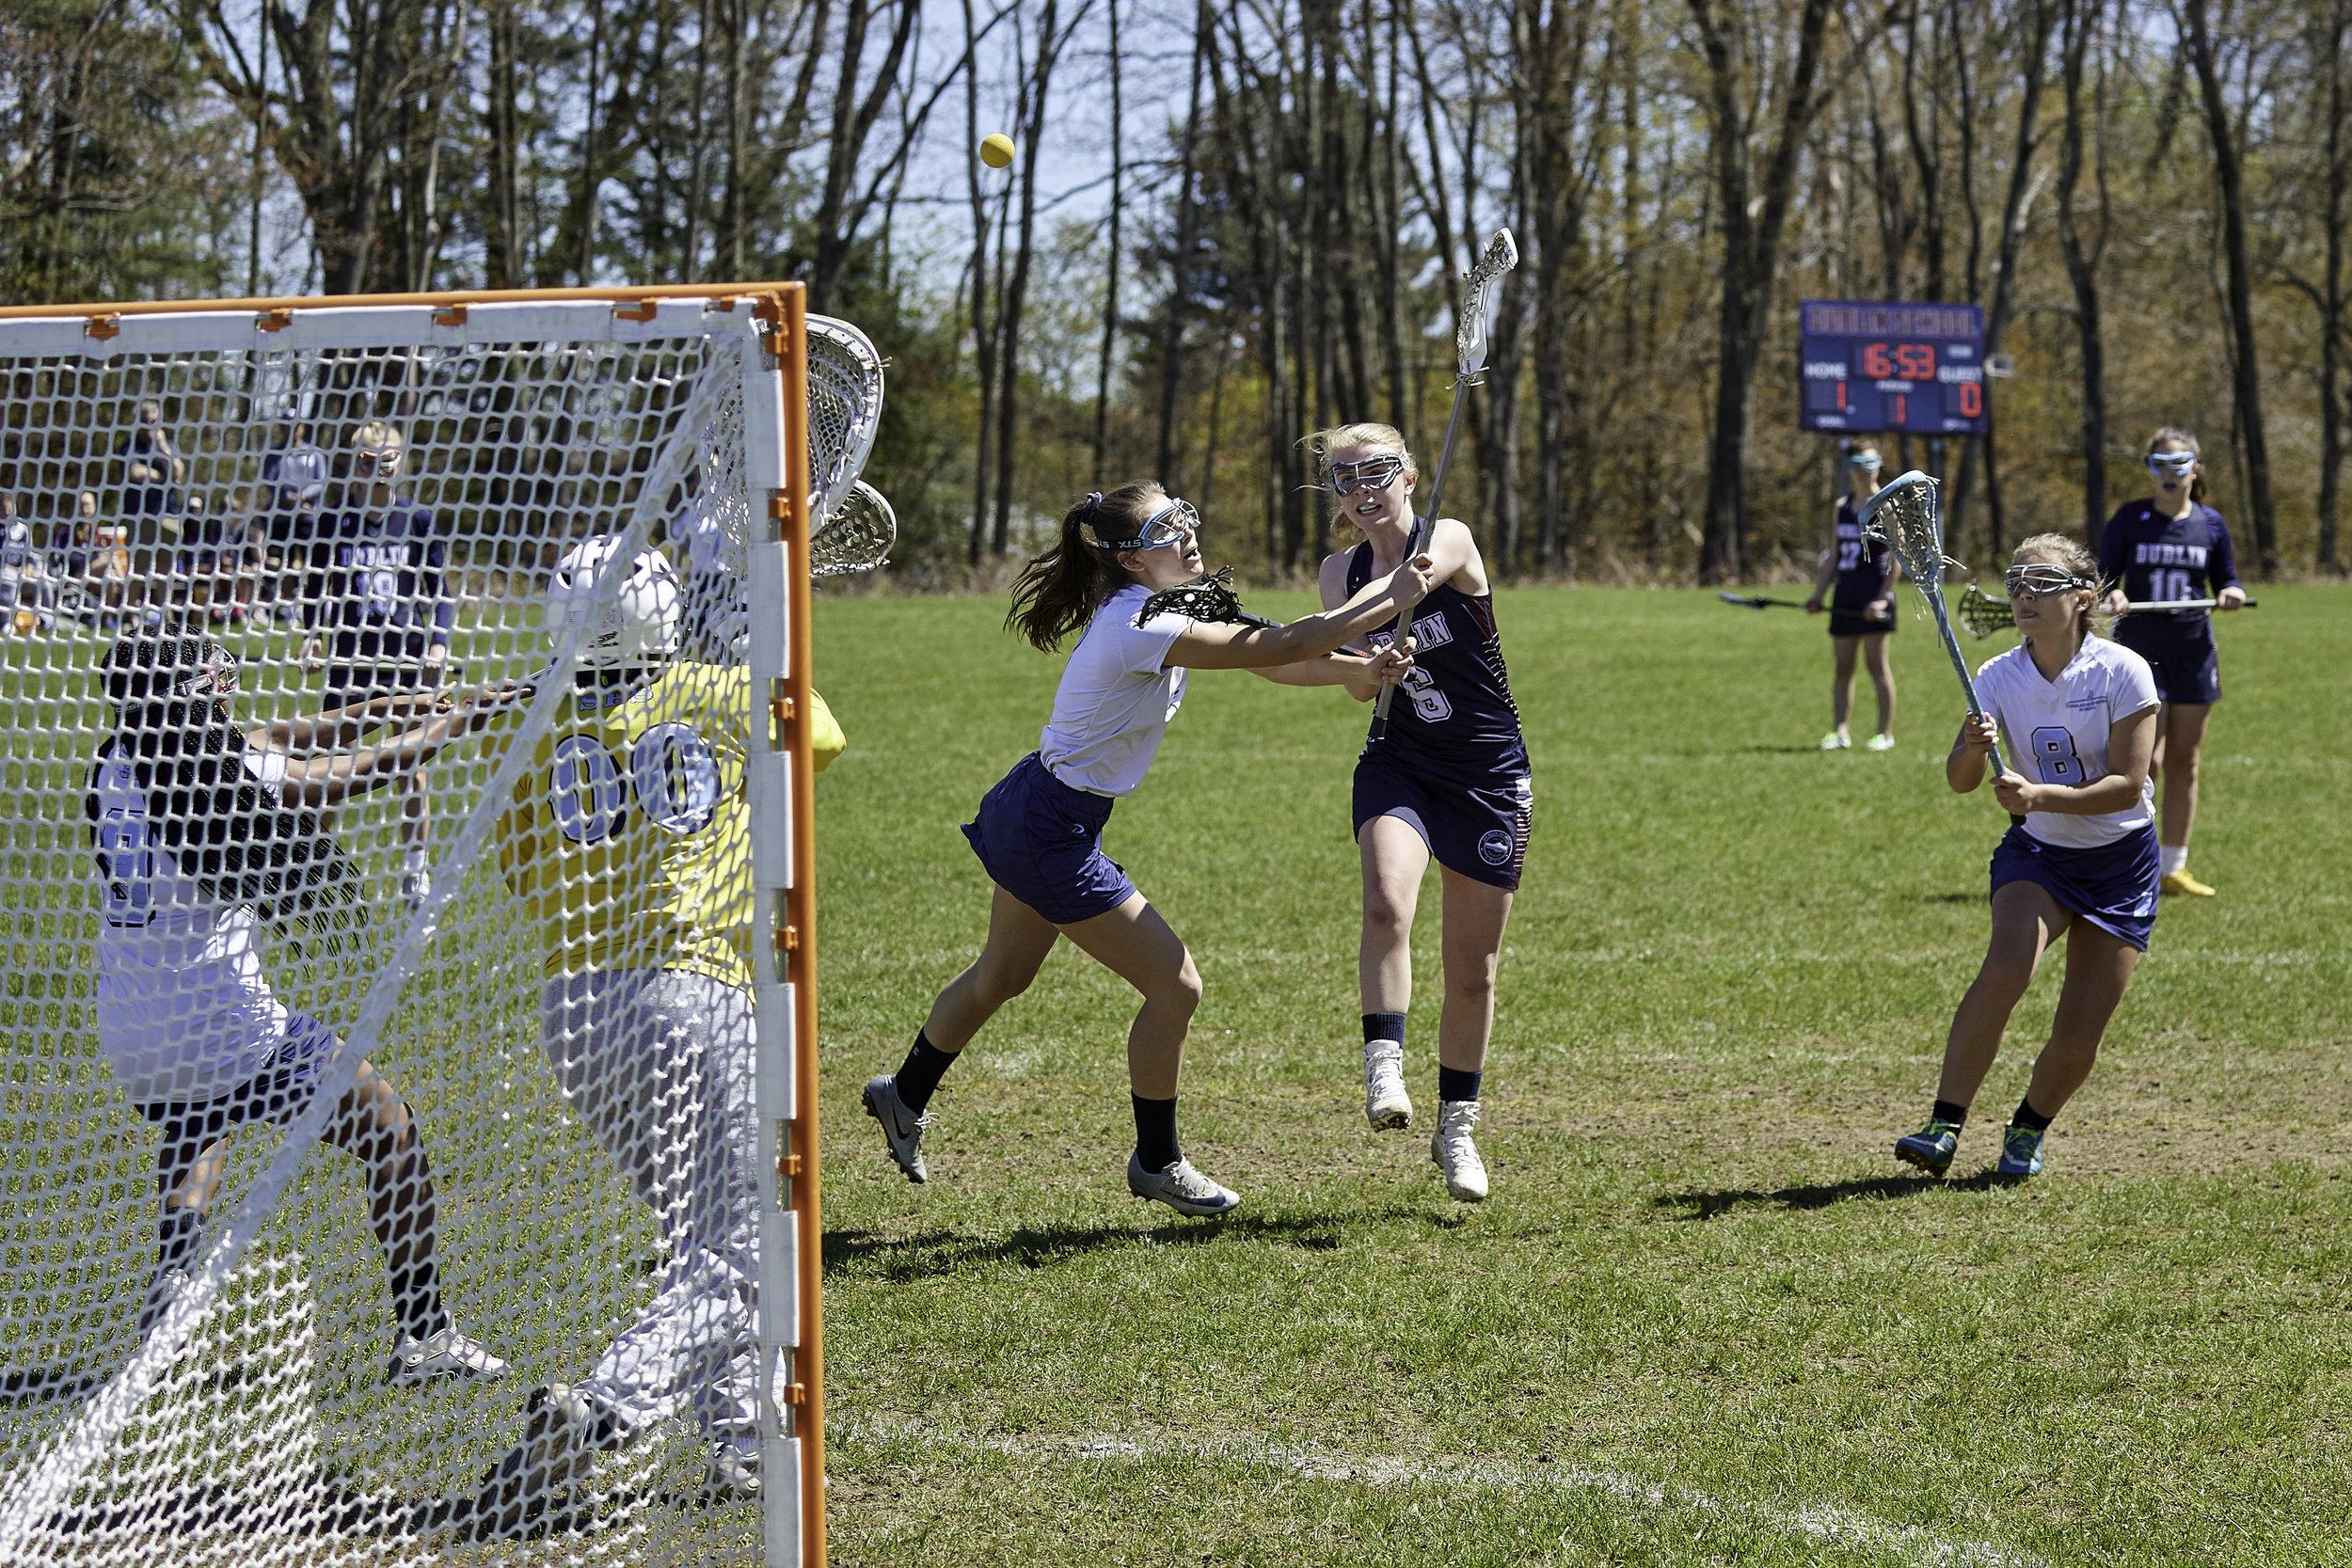 Girls Lacrosse vs. Stoneleigh Burnham School - May 11, 2019 - May 10, 2019193142.jpg